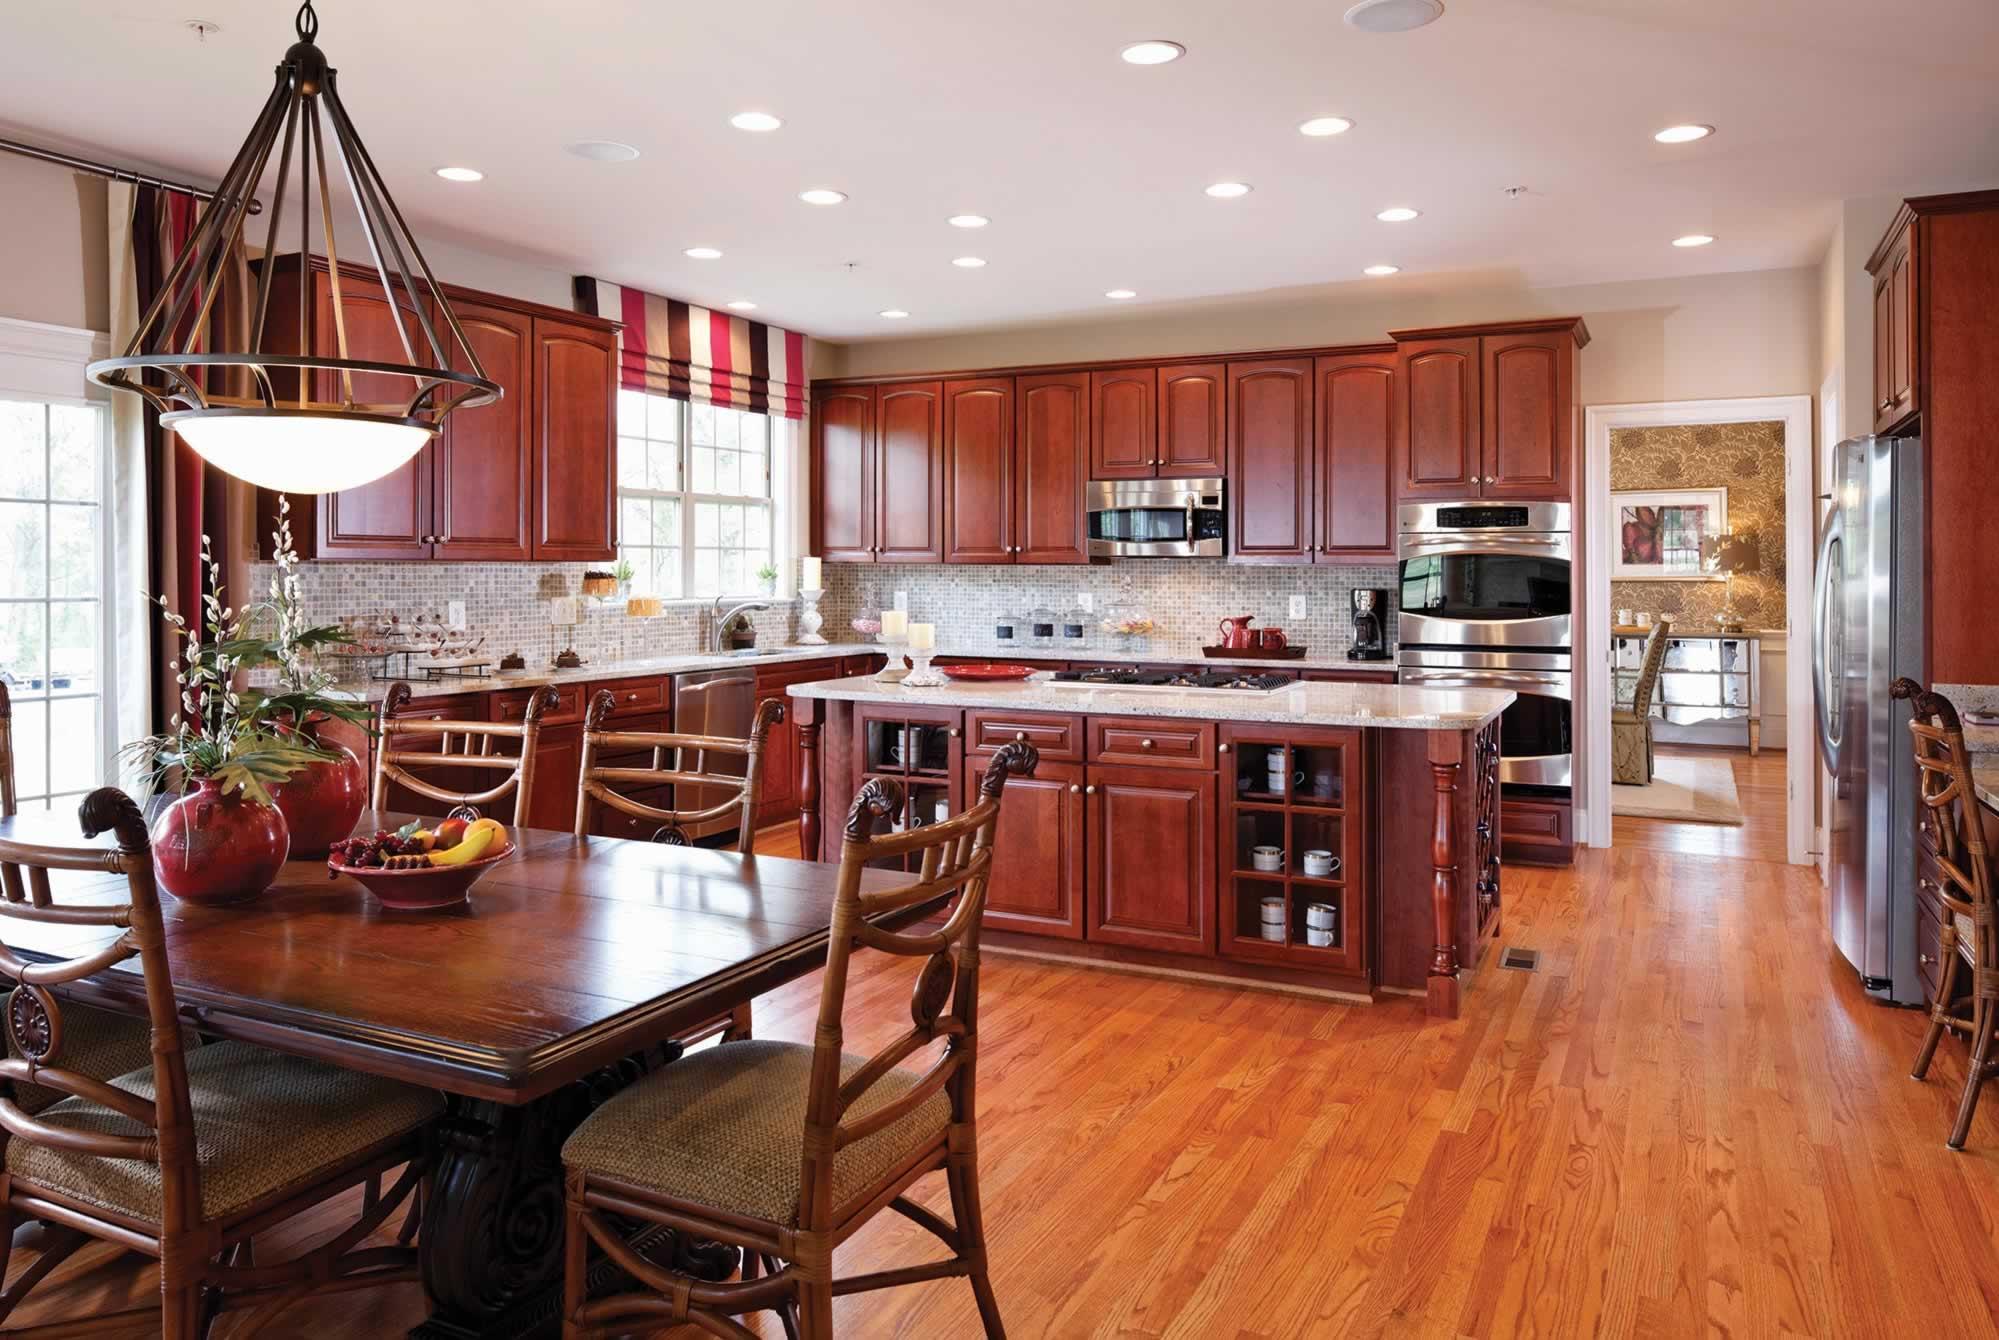 Additional photo for property listing at Clarksburg Village (Single Family Homes)-The Oakton 22001 Winding Woods Way Clarksburg, Maryland 20871 United States